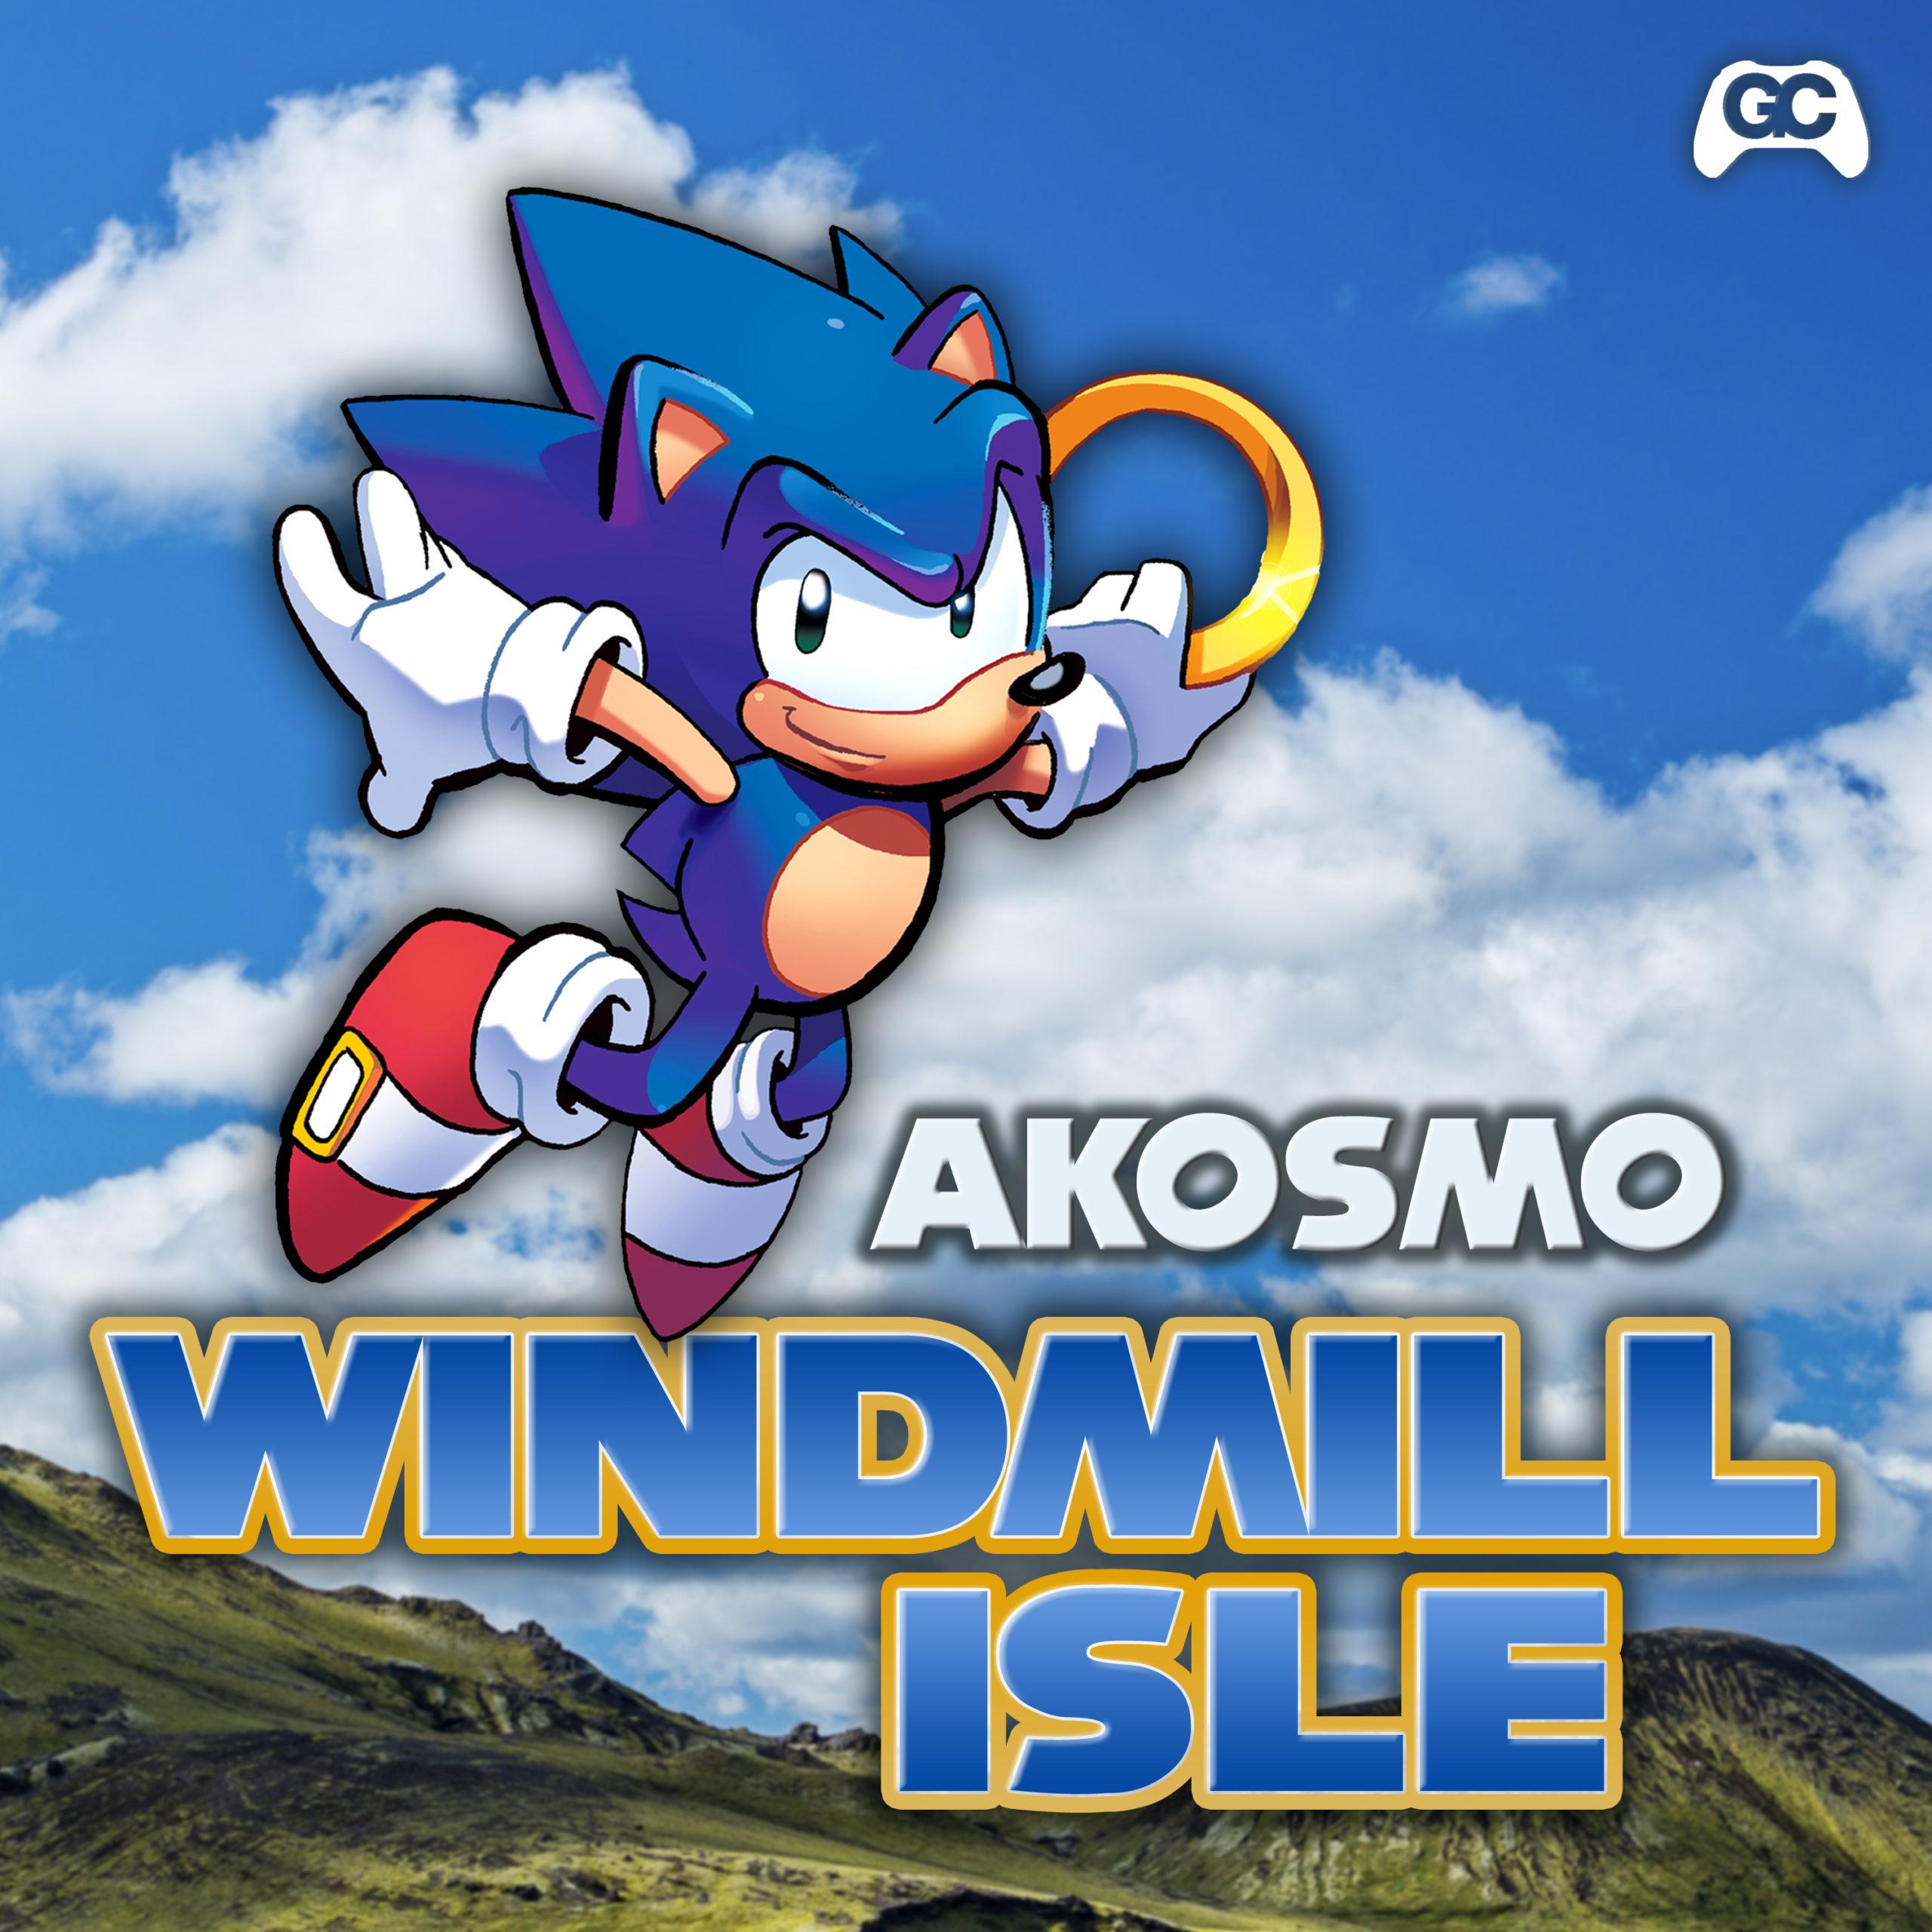 Windmill Isle – Akosmo